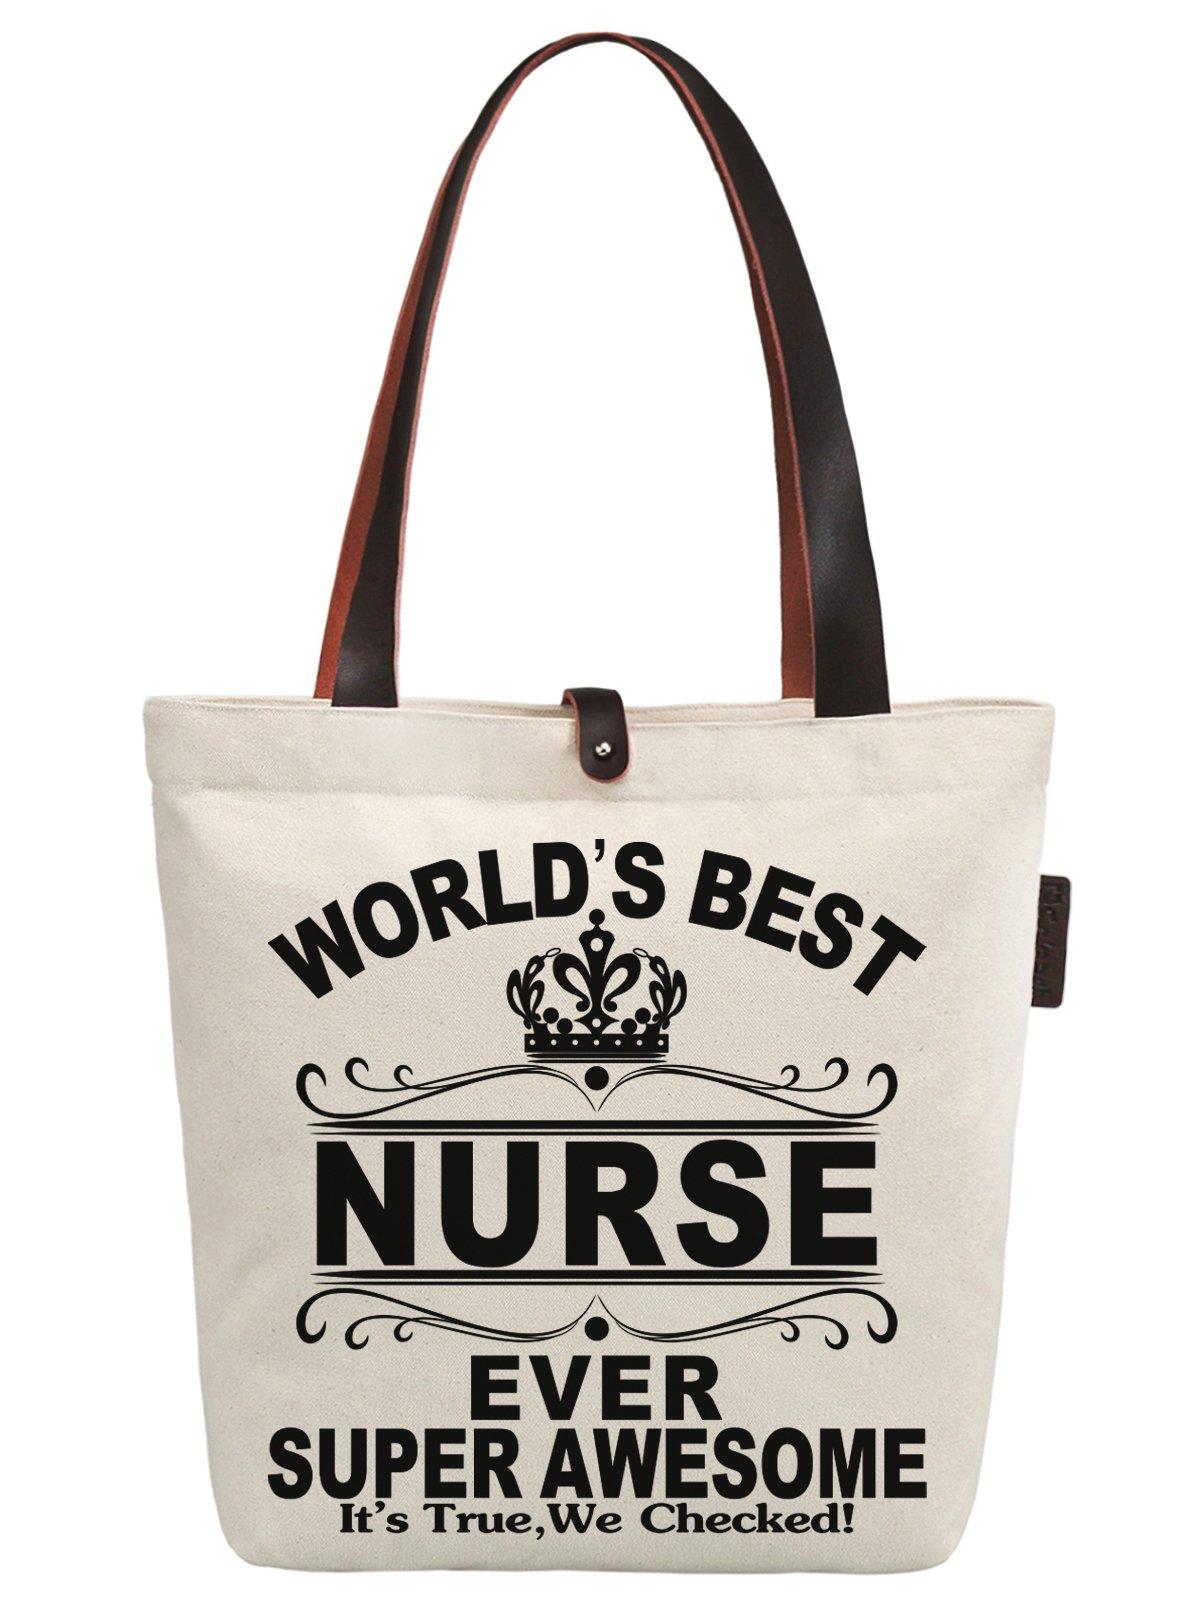 So'each Women's World's Best Nurse Ever Graphic Canvas Handbag Tote Shoulder Bag